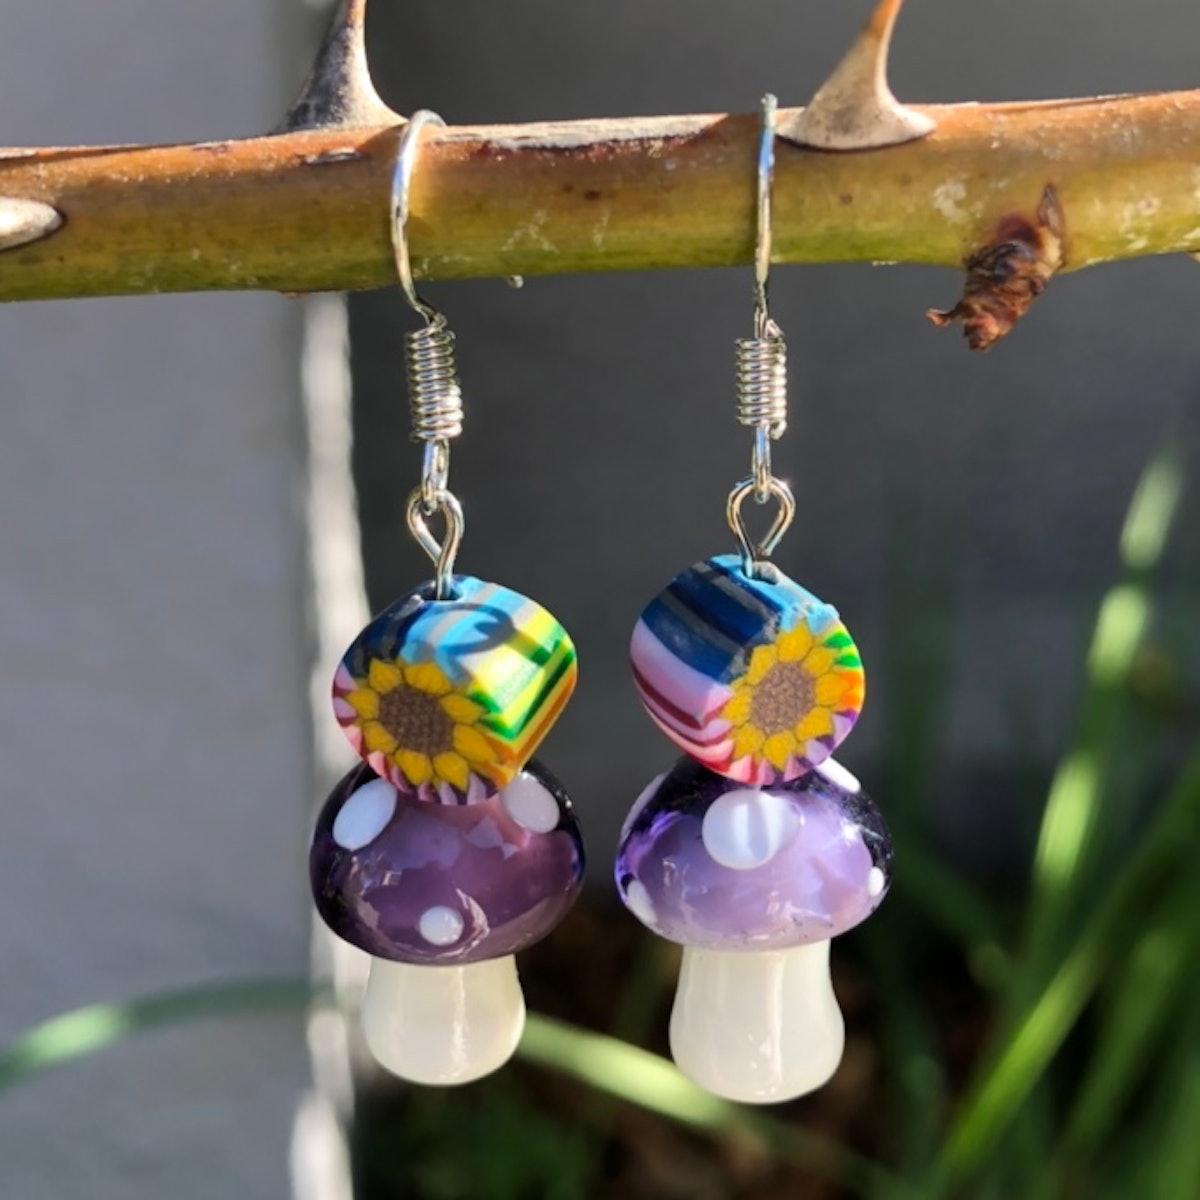 Fairyjewelz Handmade Mushroom Flower Earrings